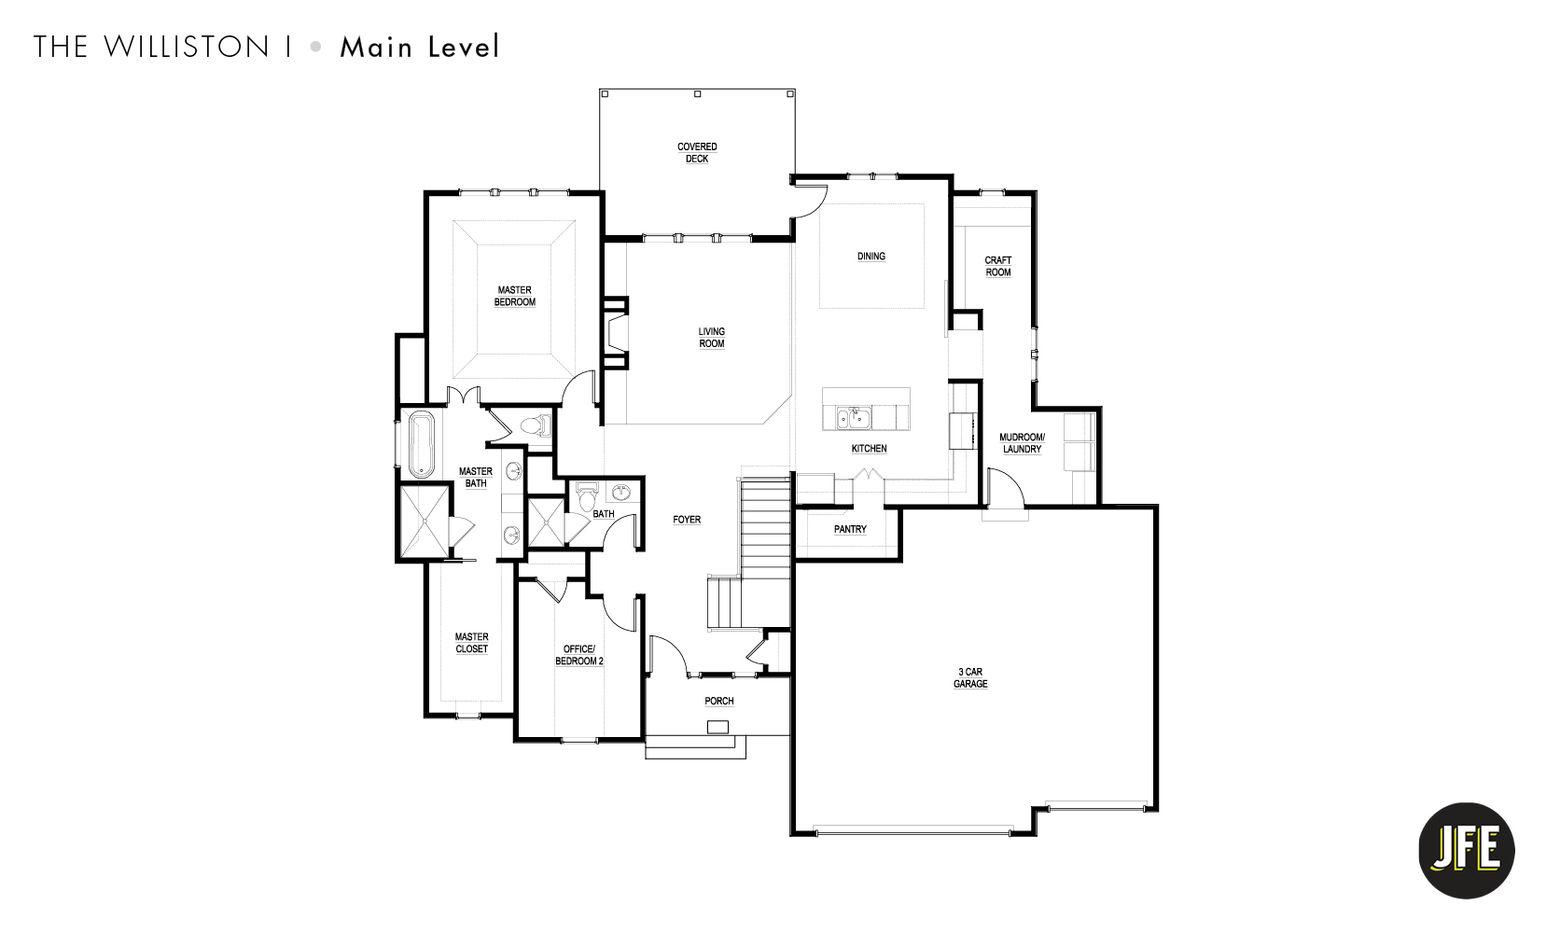 The-Williston-I-Main-Level.jpg